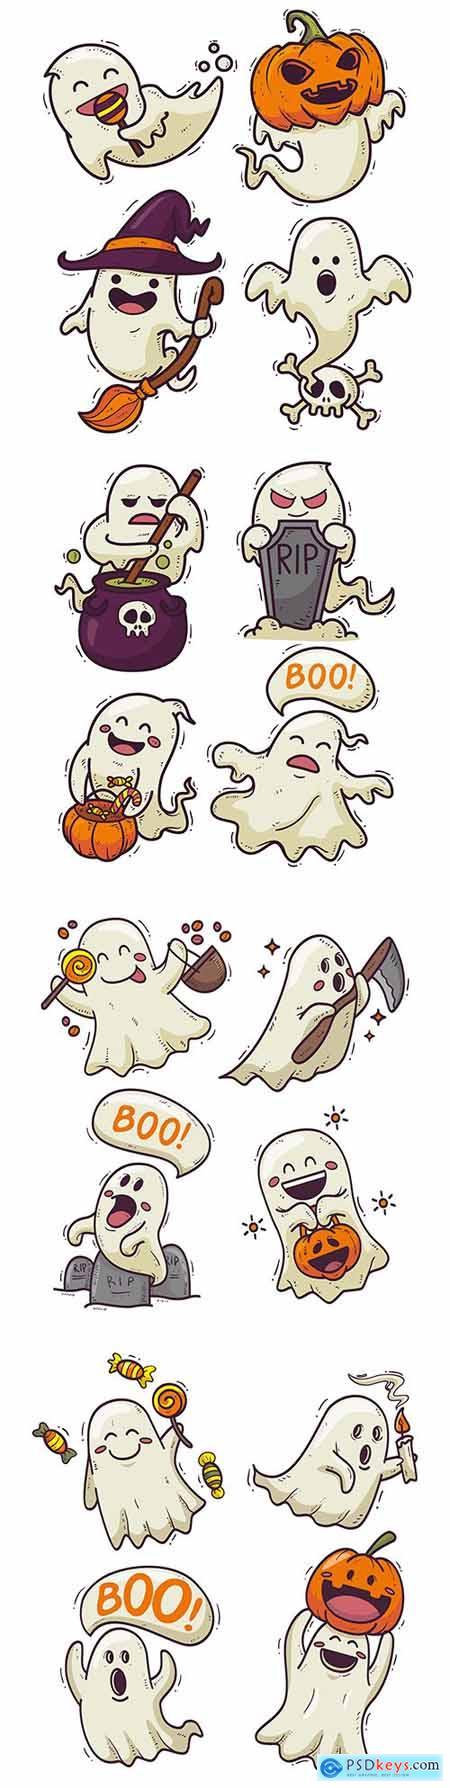 Halloween cartoon ghost drawn illustrations